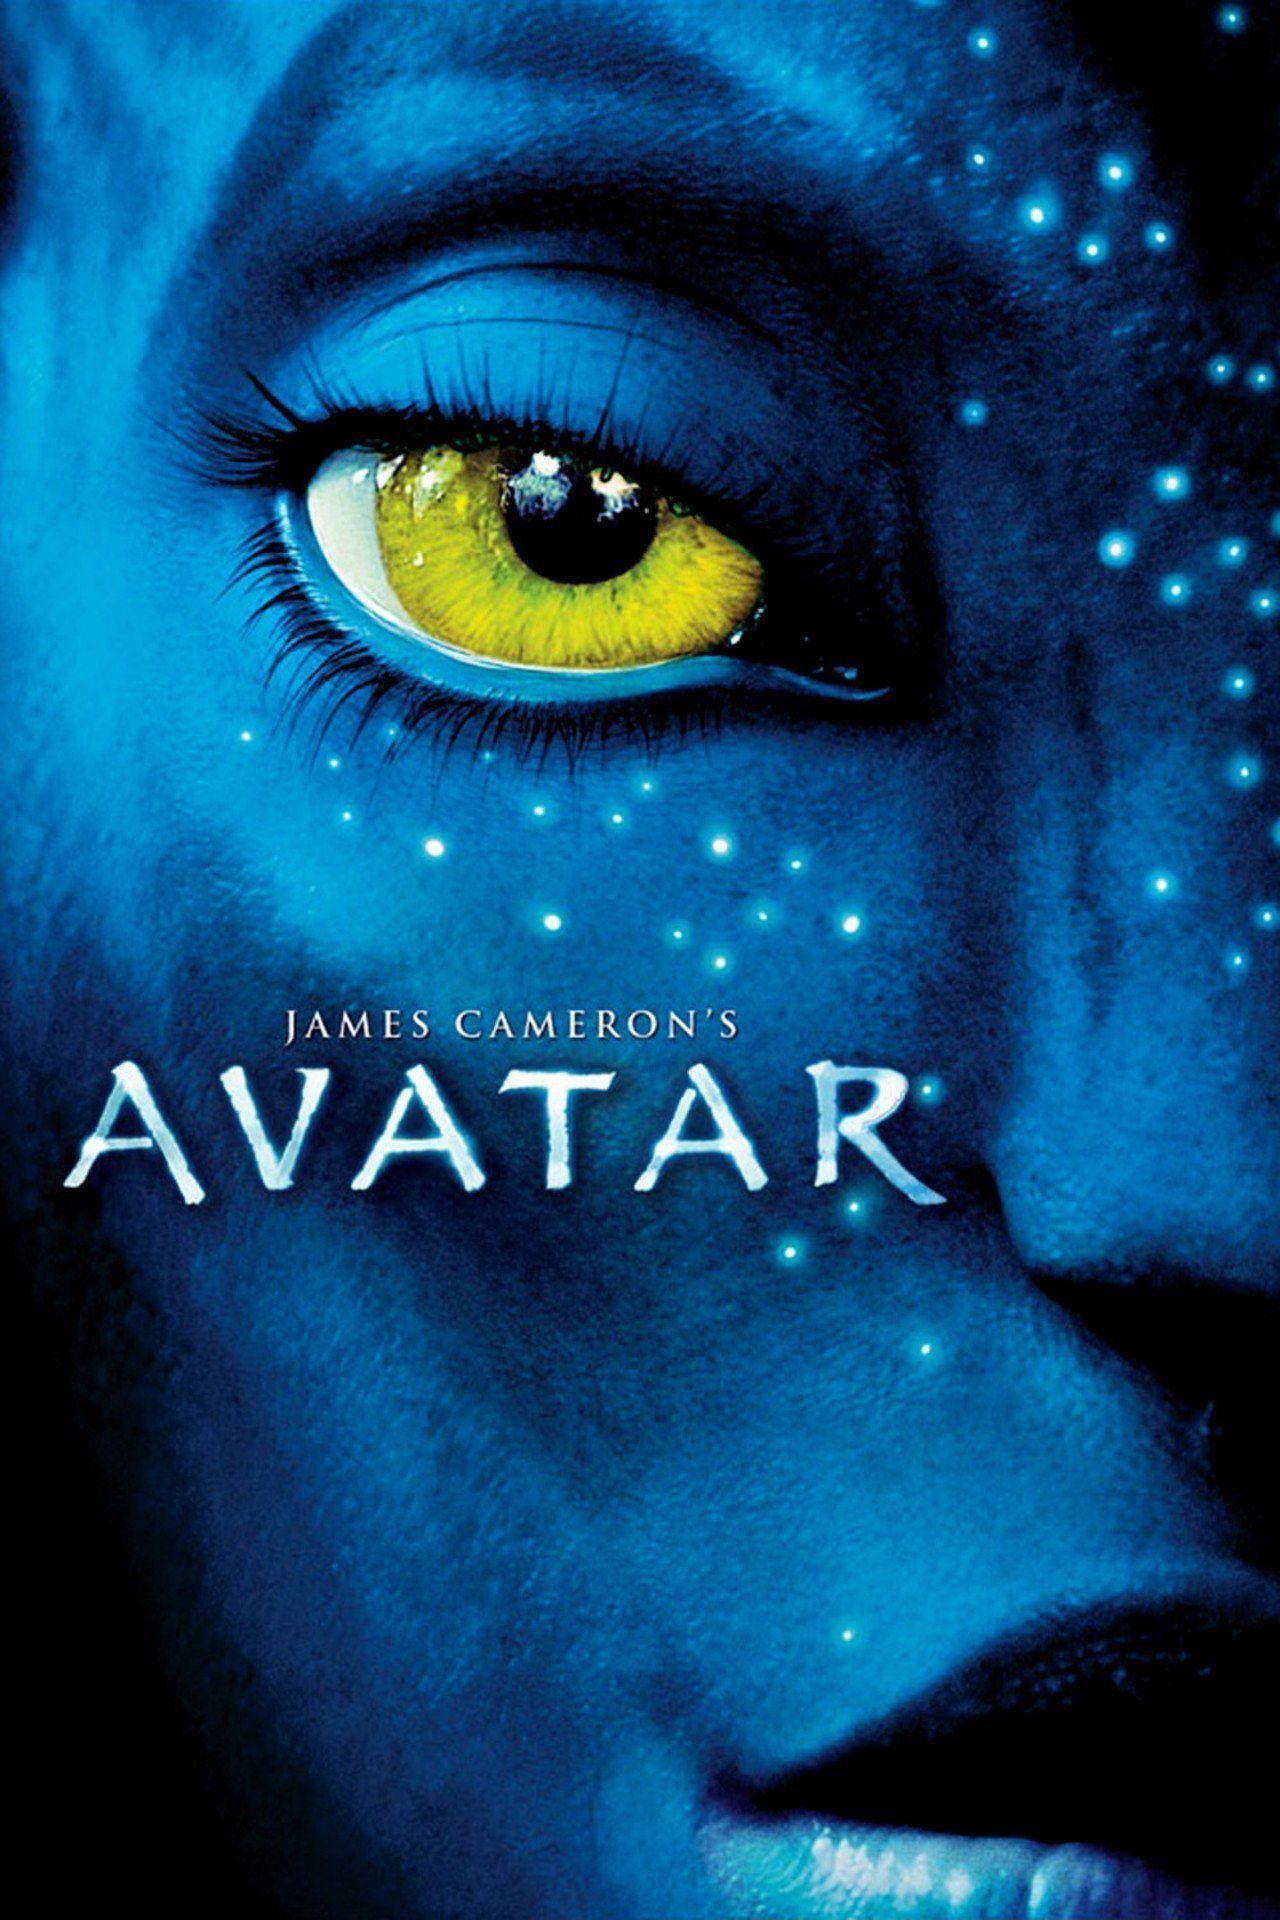 Pin By Theparademon14 On Peliculas Avatar Full Movie Avatar Movie Avatar Dvd